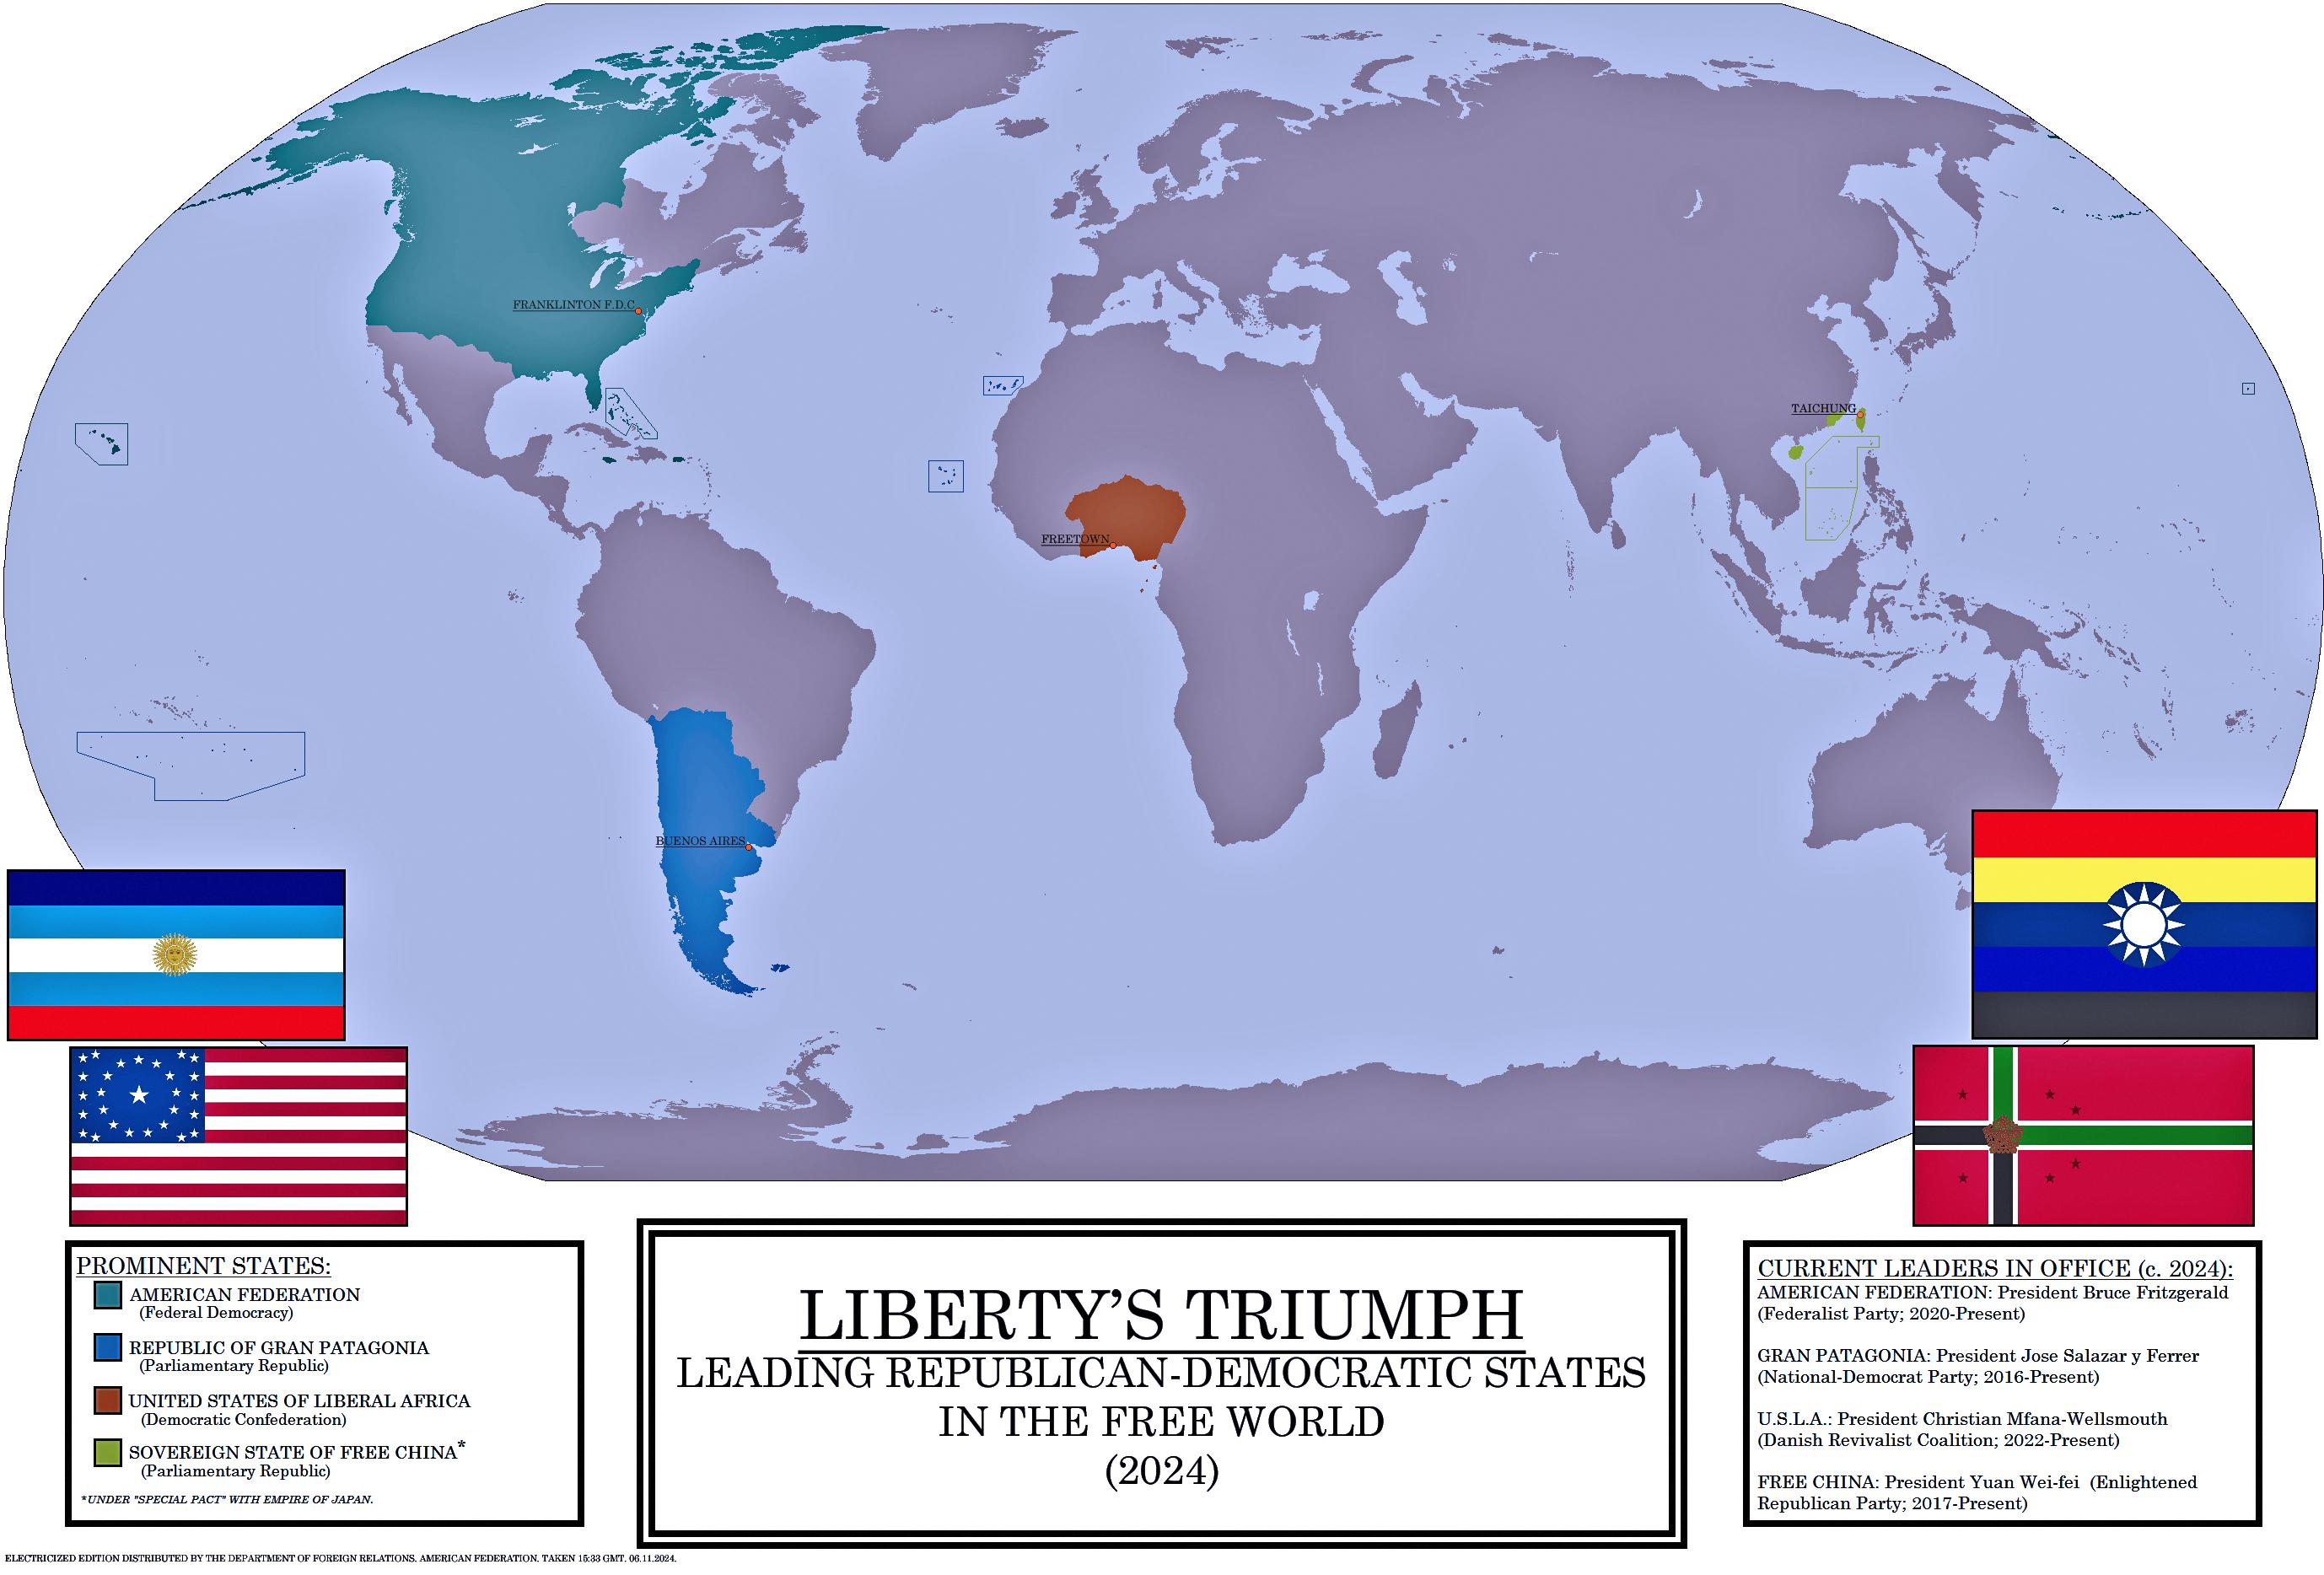 Liberty's Triumph: RDNA-verse by mdc01957